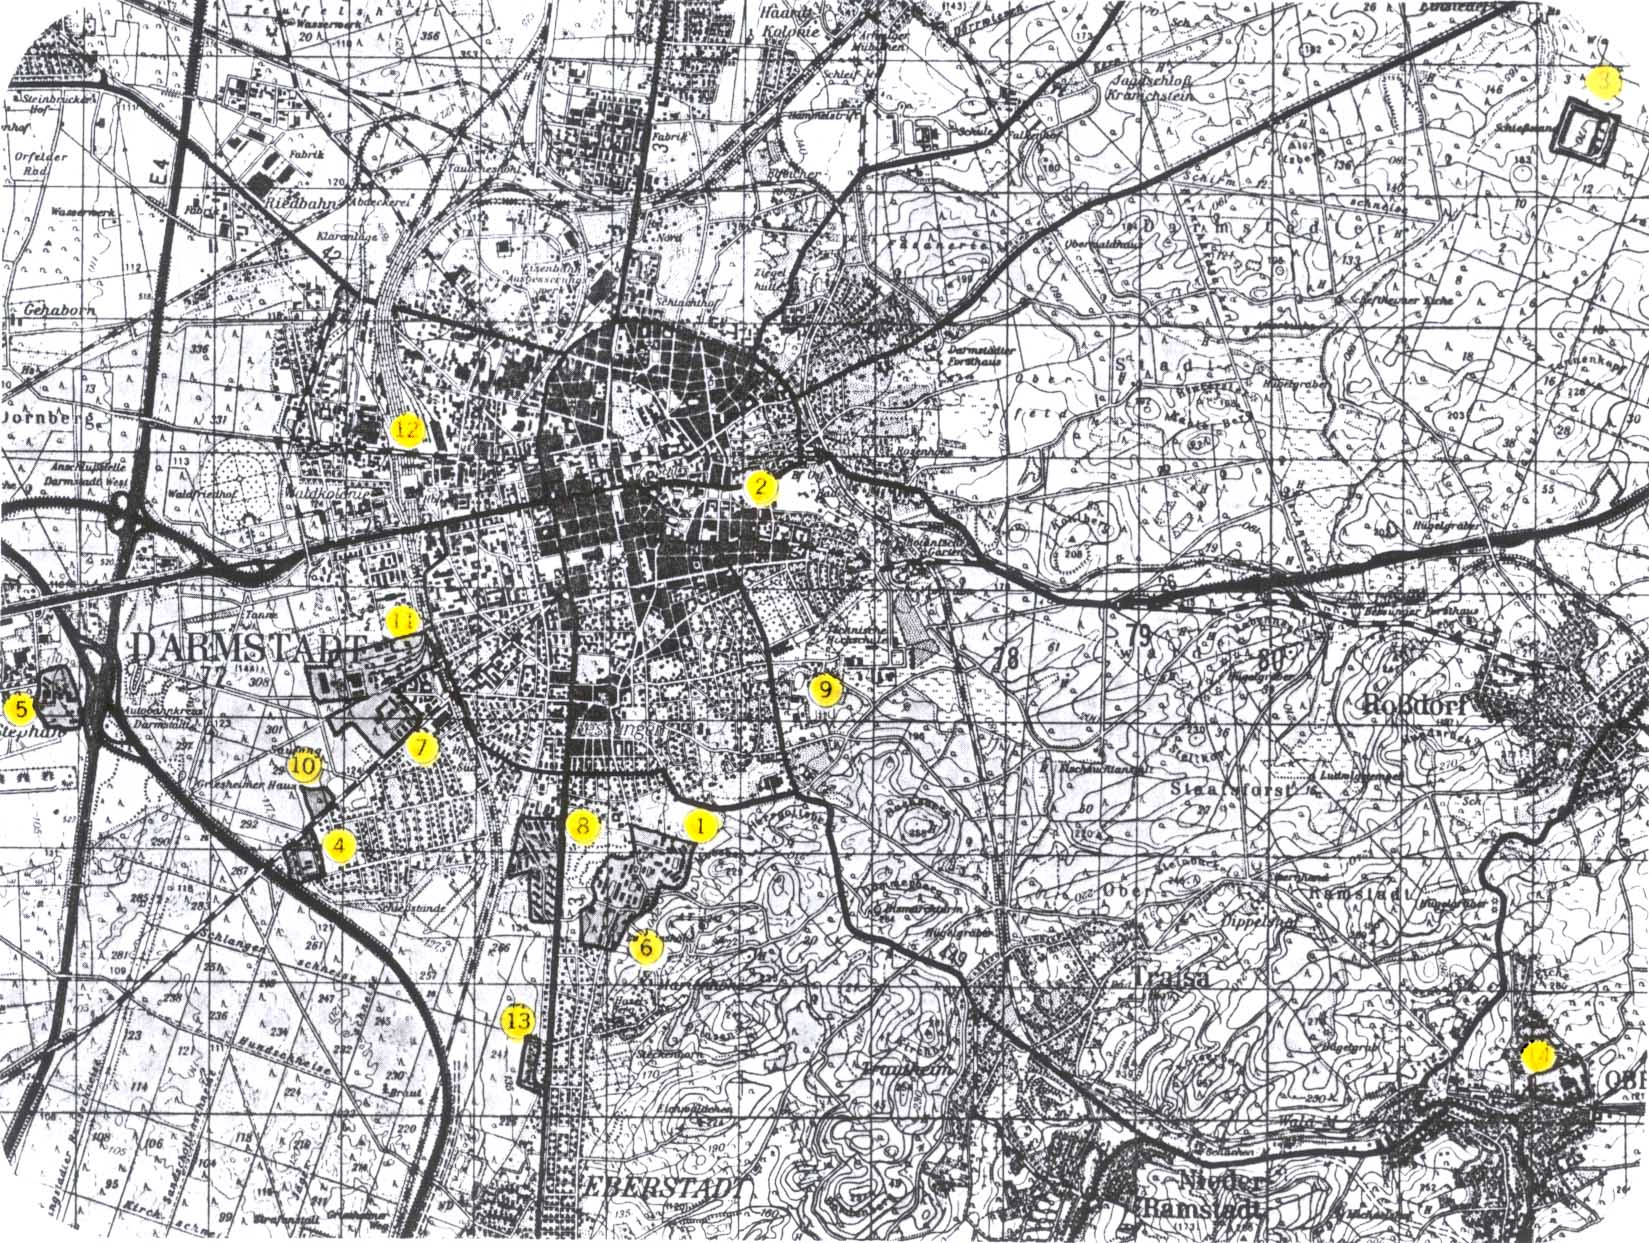 File Map Darmstadt 1980 Jpg Wikimedia Commons